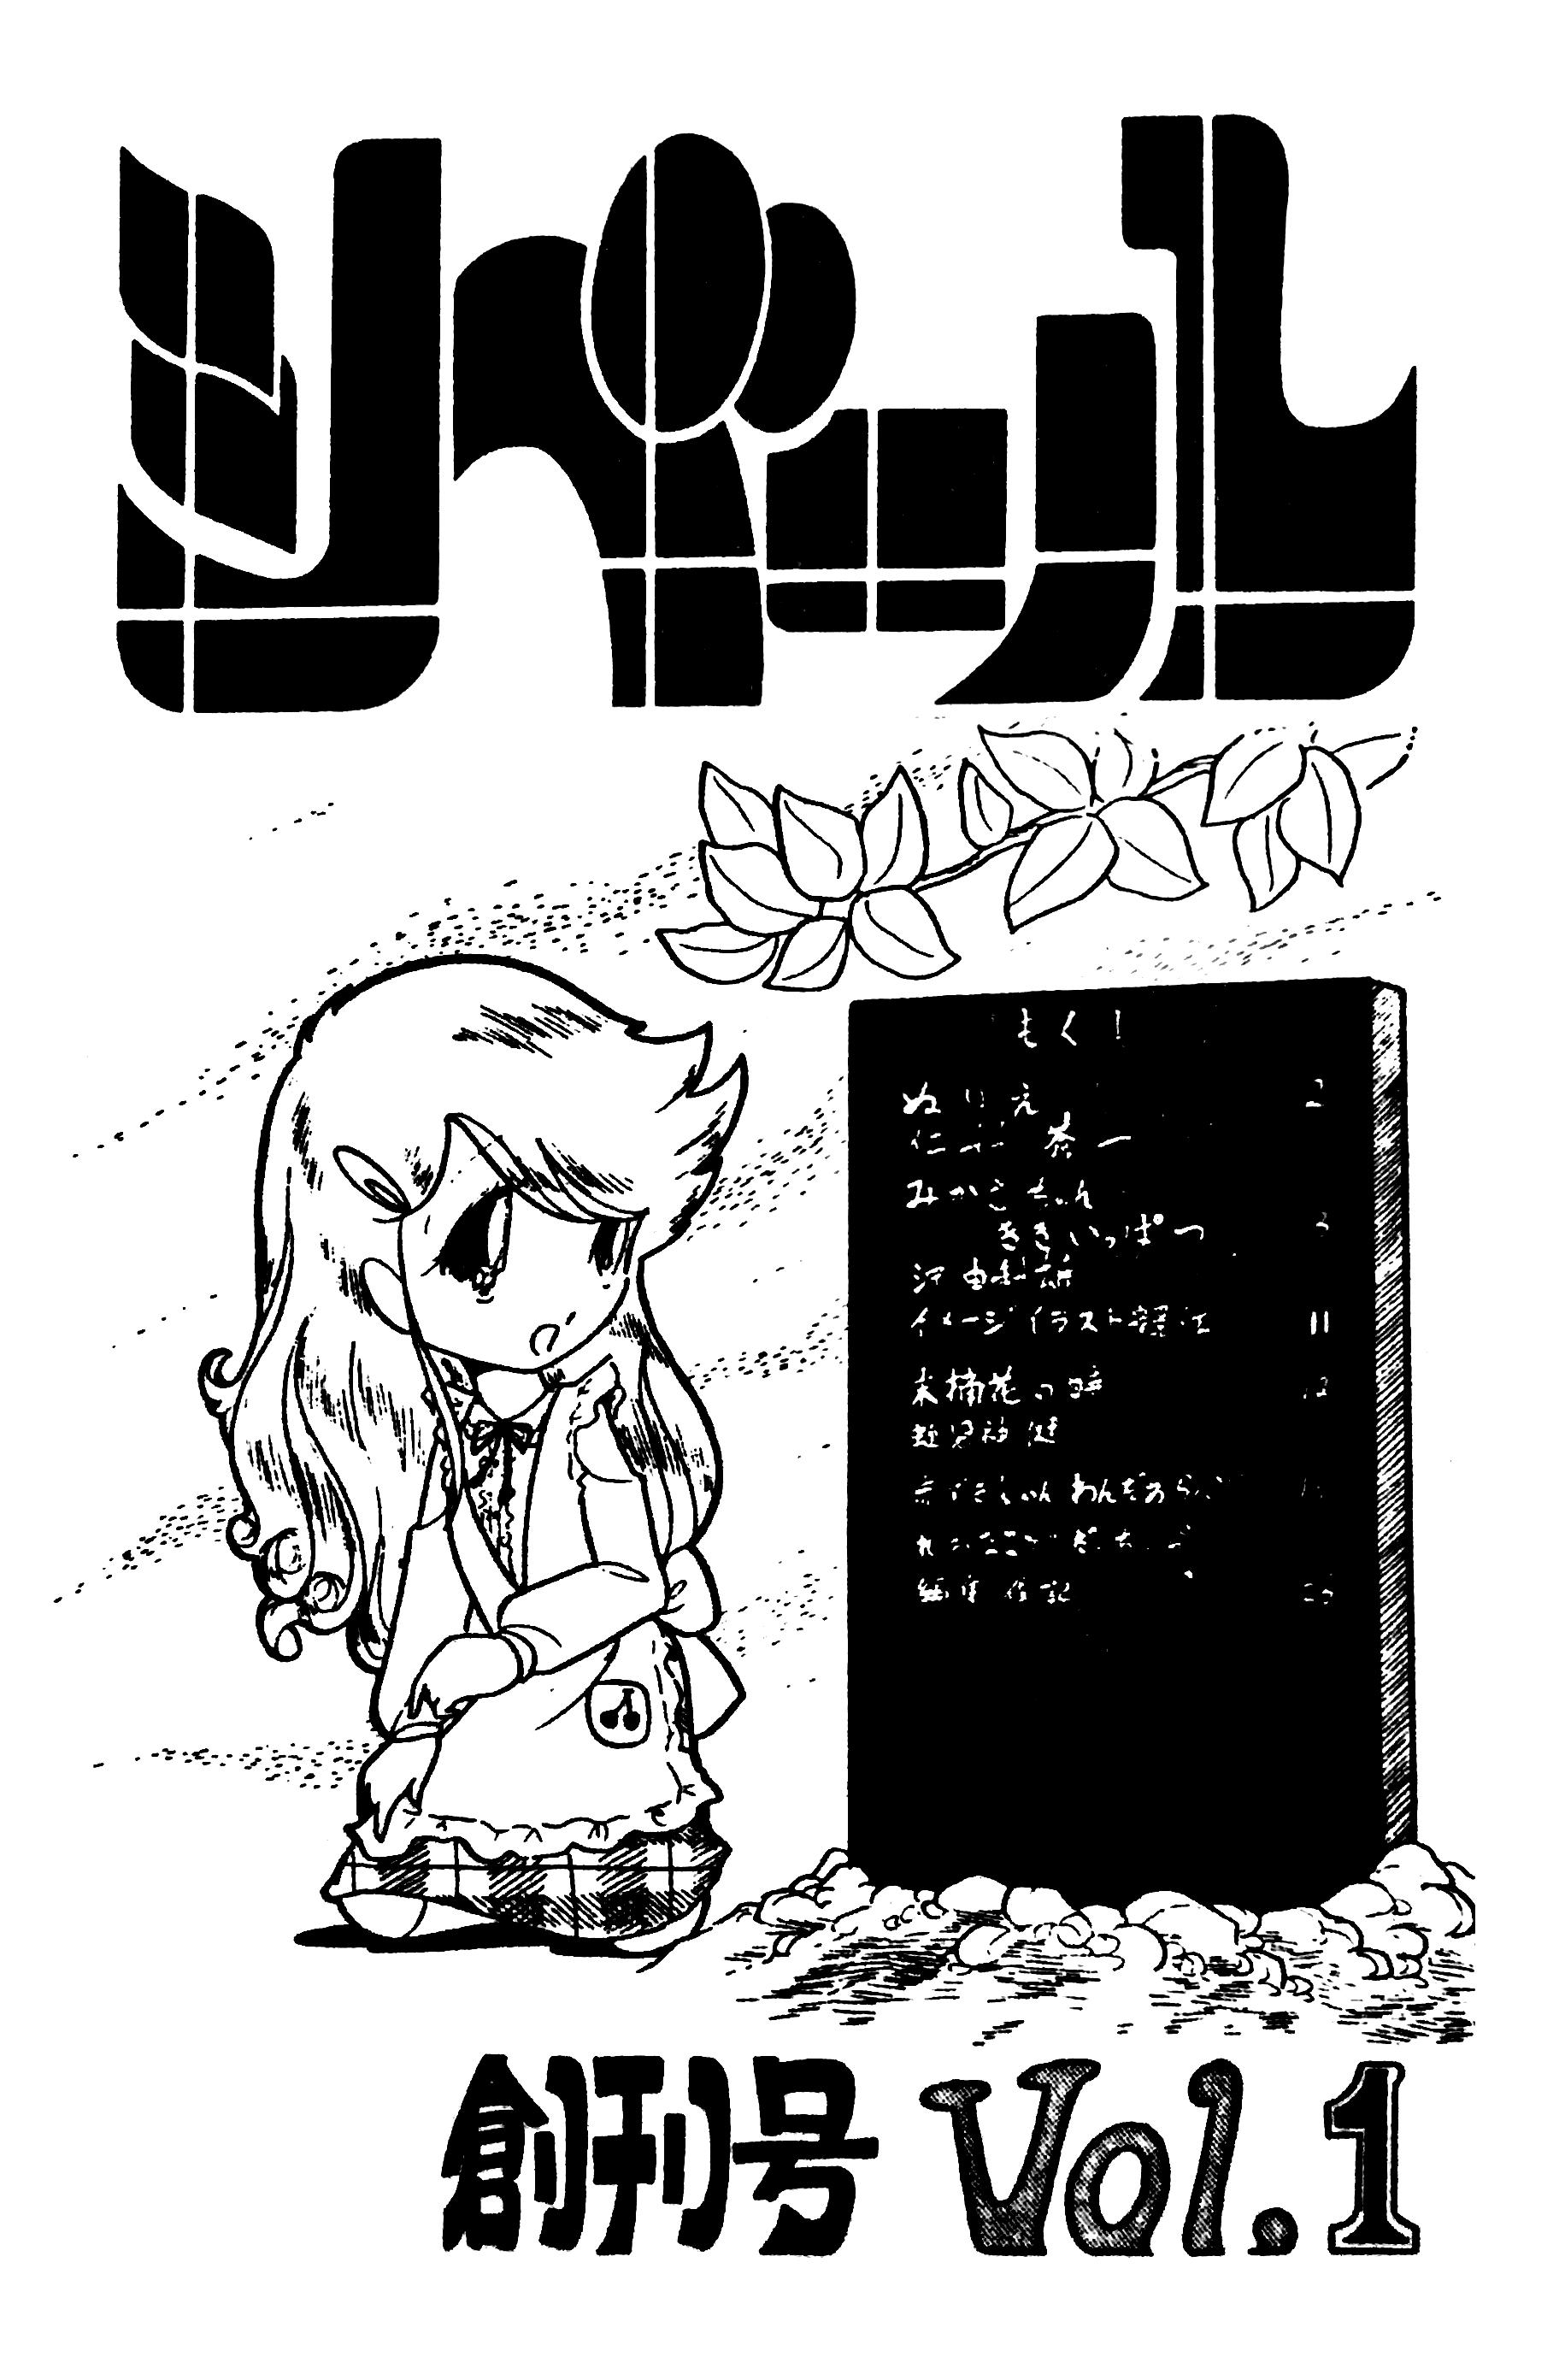 f:id:kougasetumei:20191014173309p:image